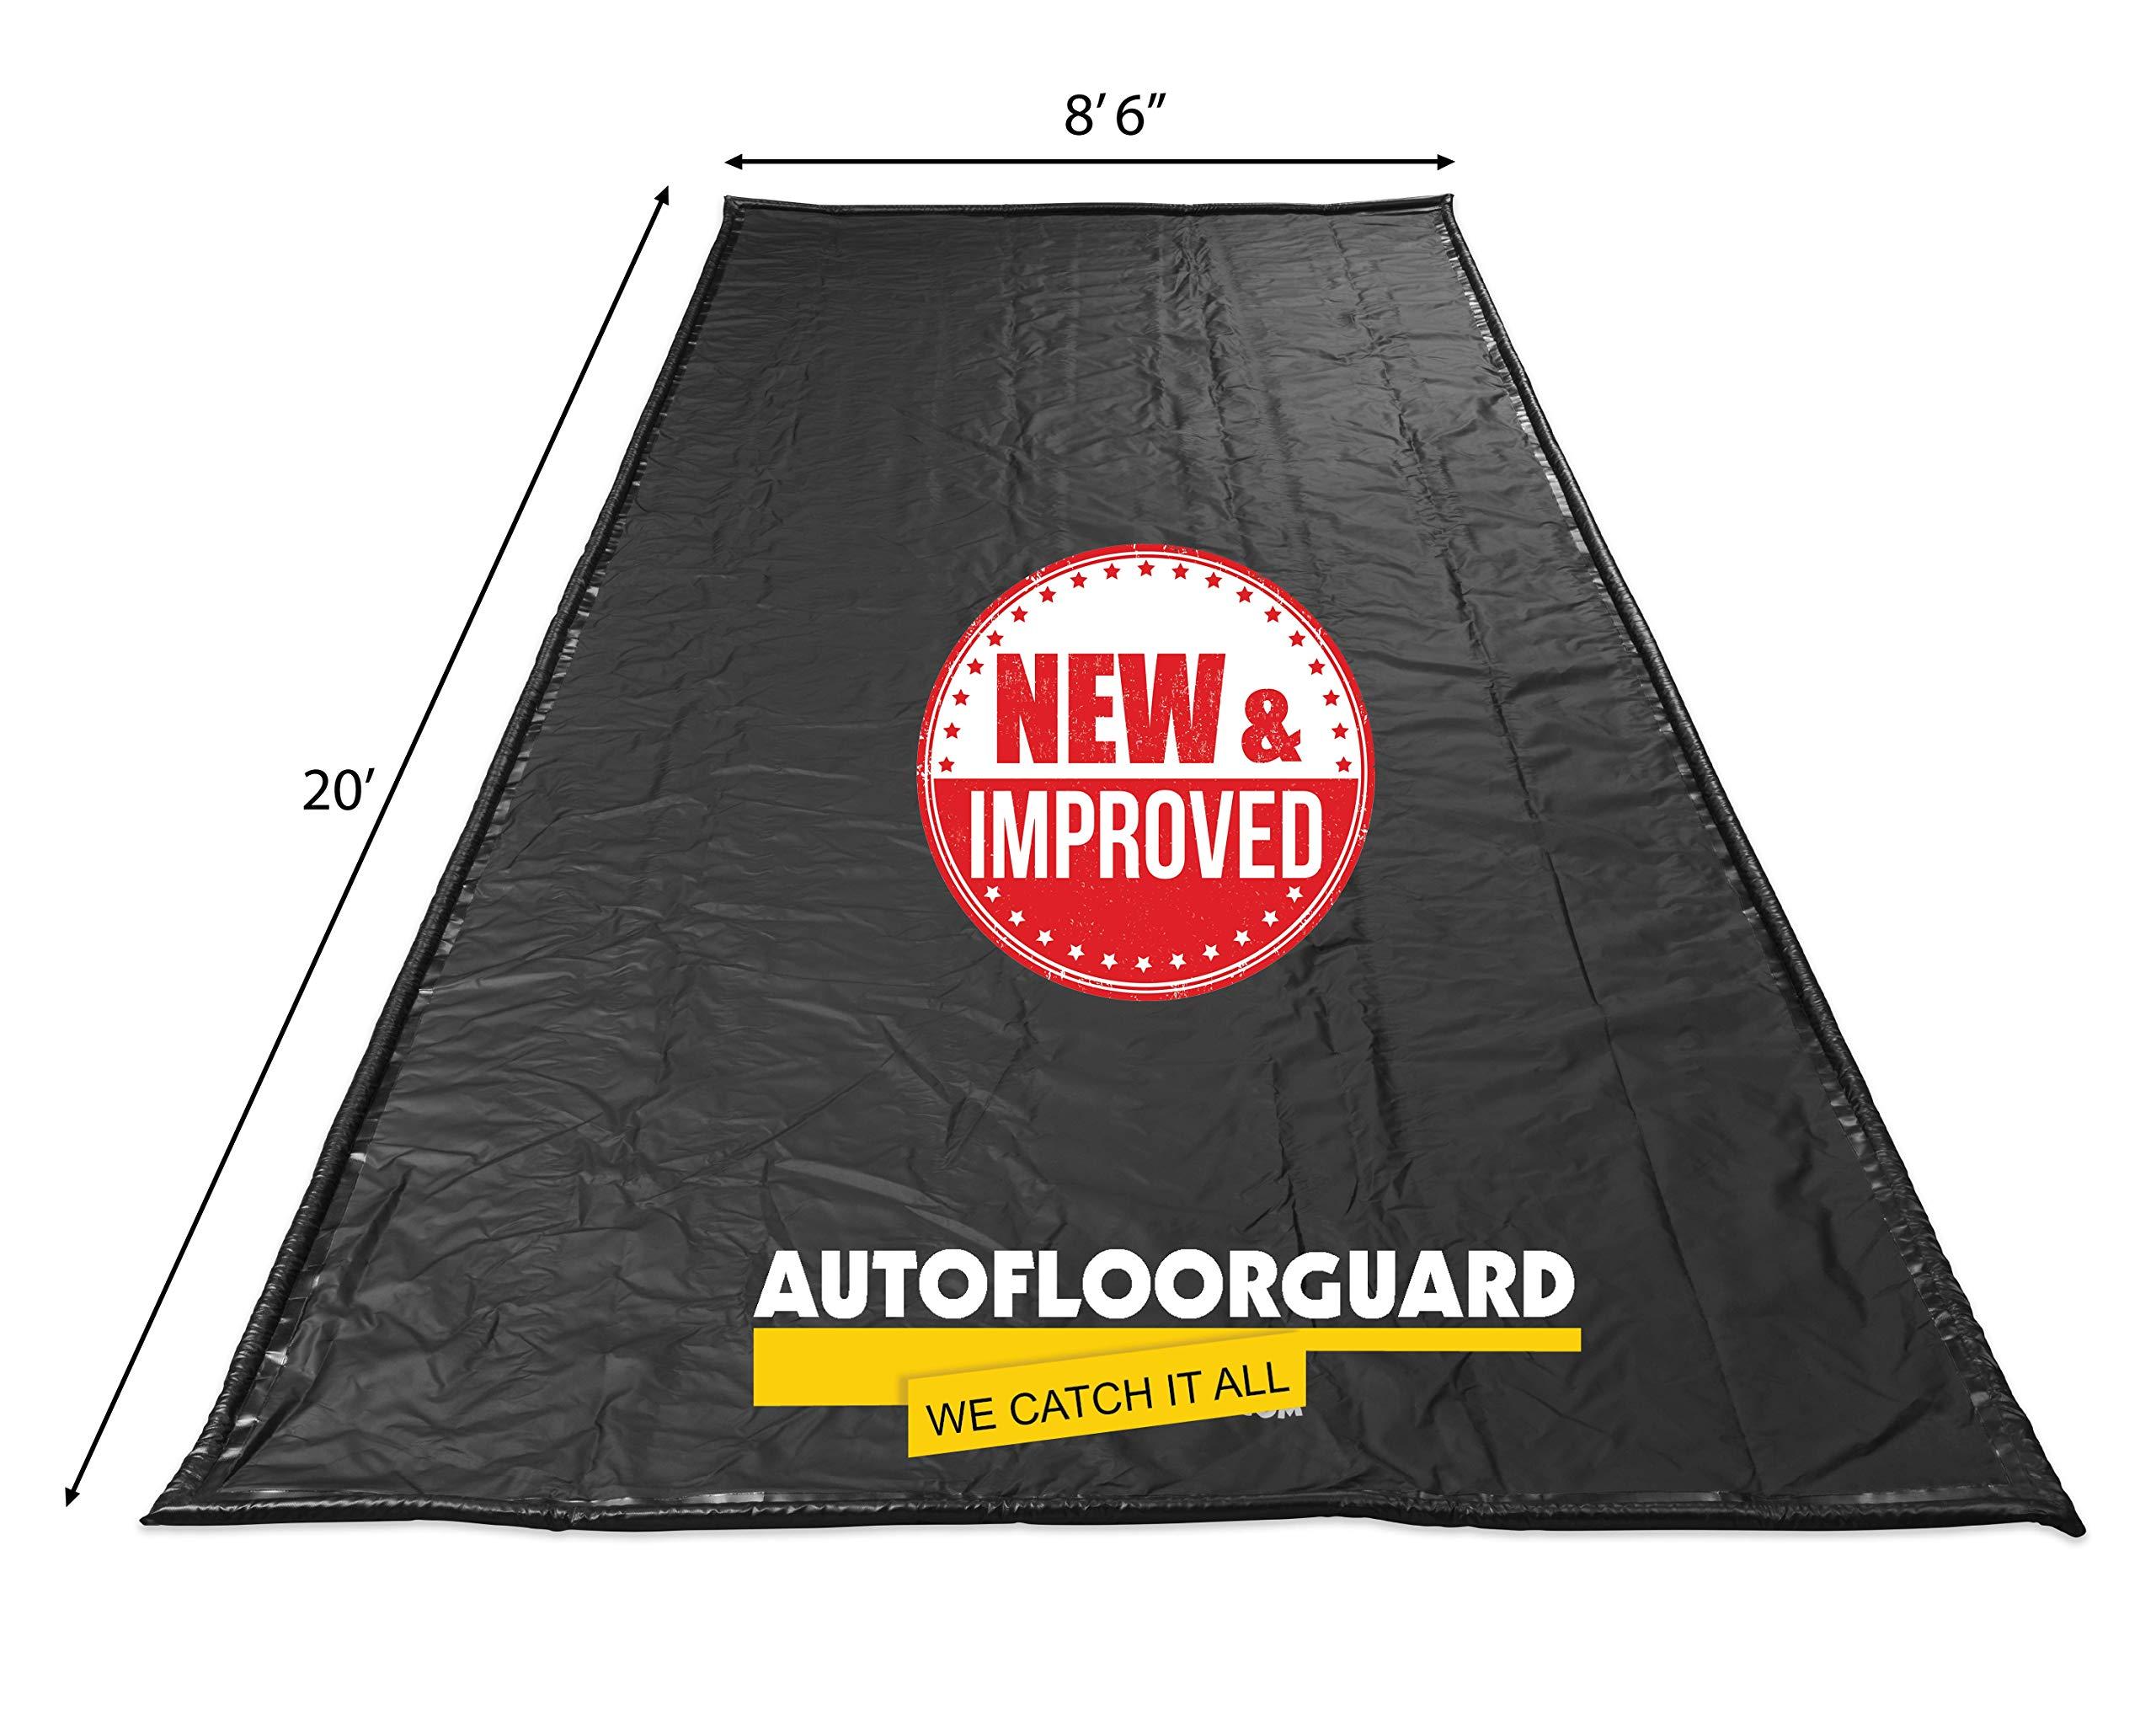 AutoFloorGuard AFGD-8620 Black 8'6'' x 20' SUV/Truck Size Containment Mat